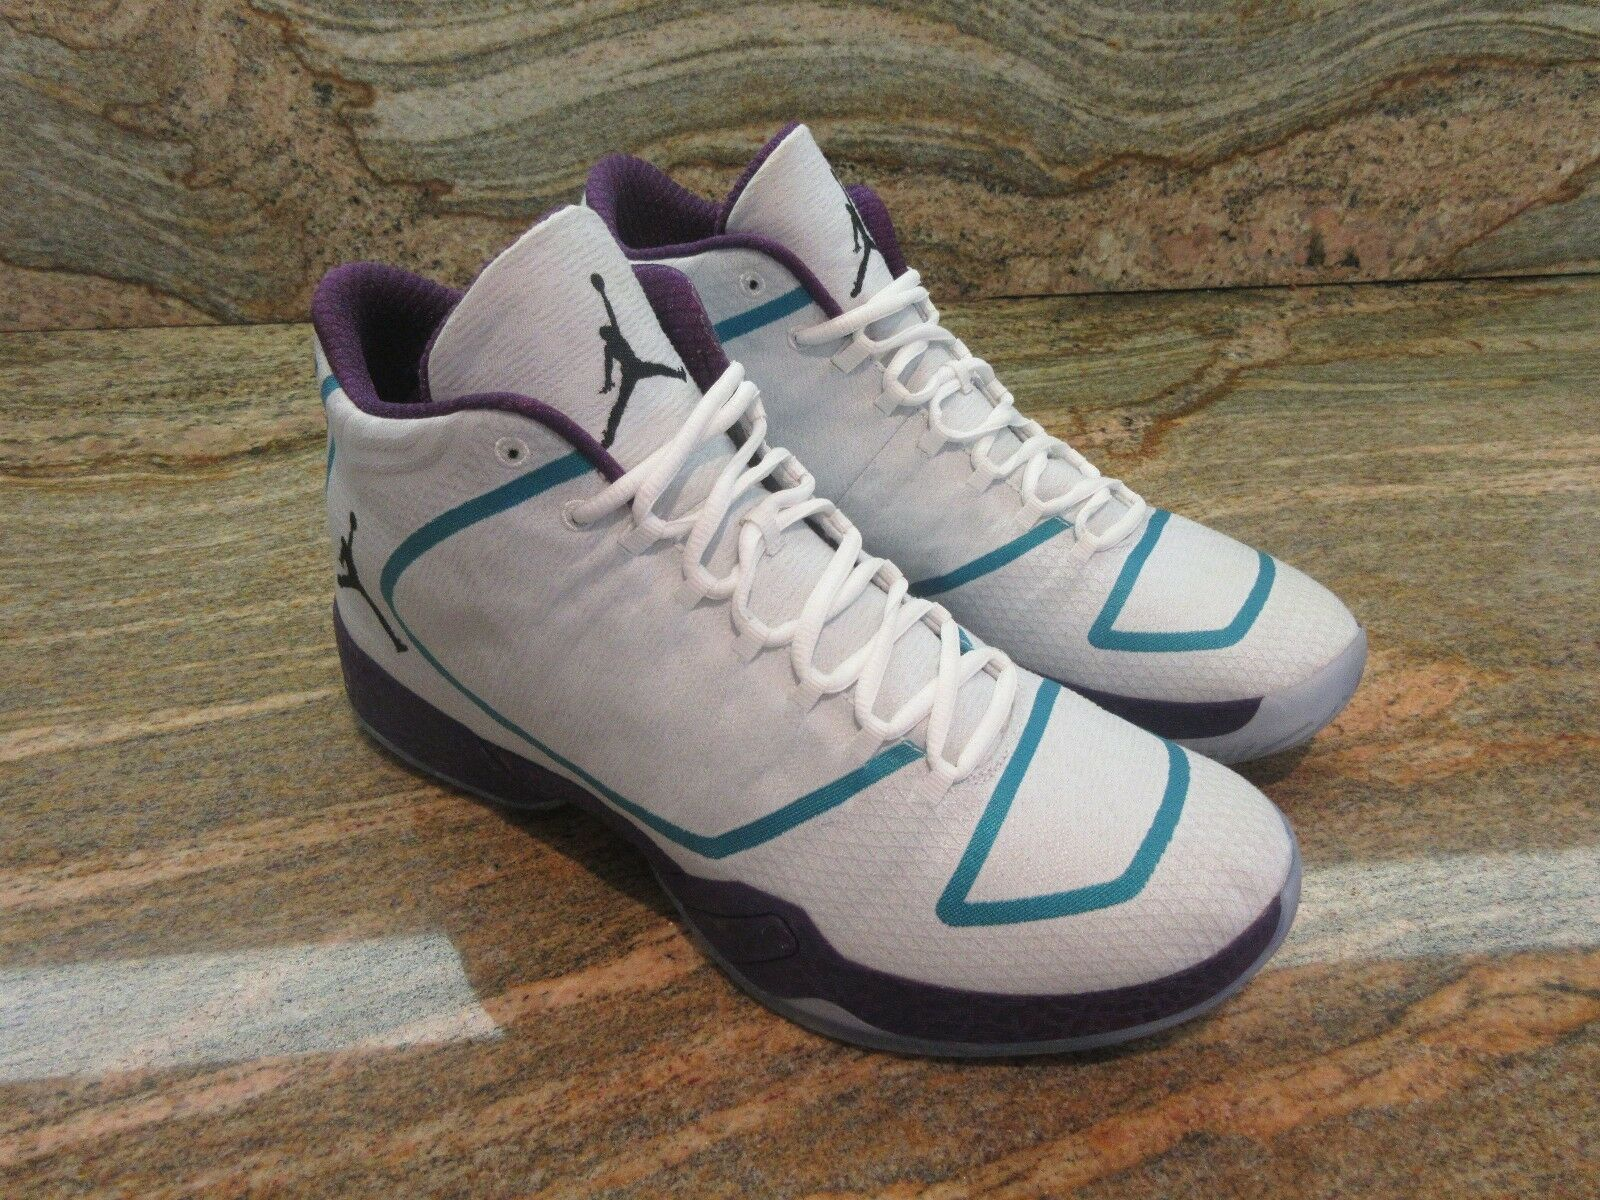 3436a2e0f0ee Unreleased Nike Air Jordan XX9 29 Promo SZ Sample SZ Promo 13 Charlotte ...